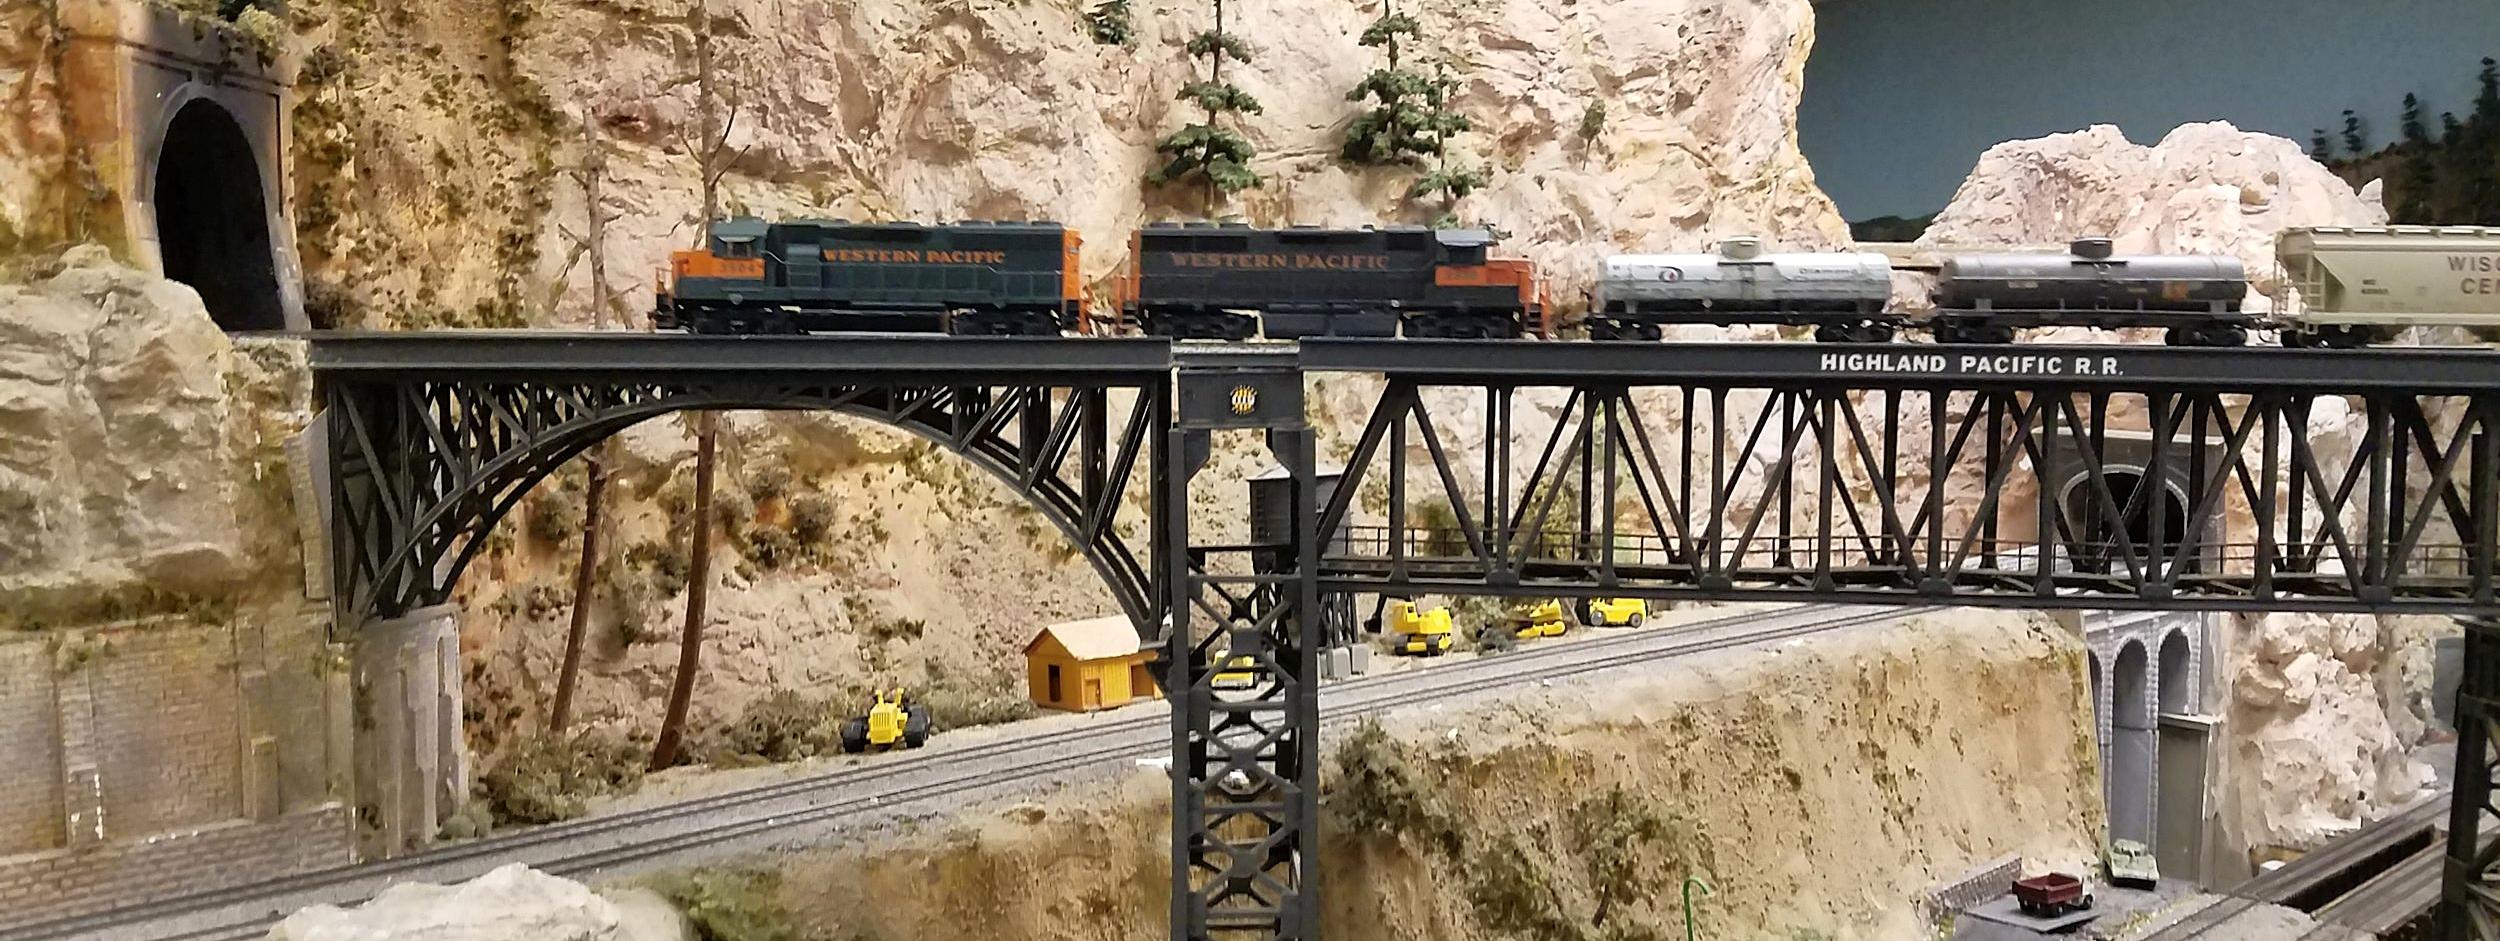 David Dodds, modeler, Highland Pacific Railroad